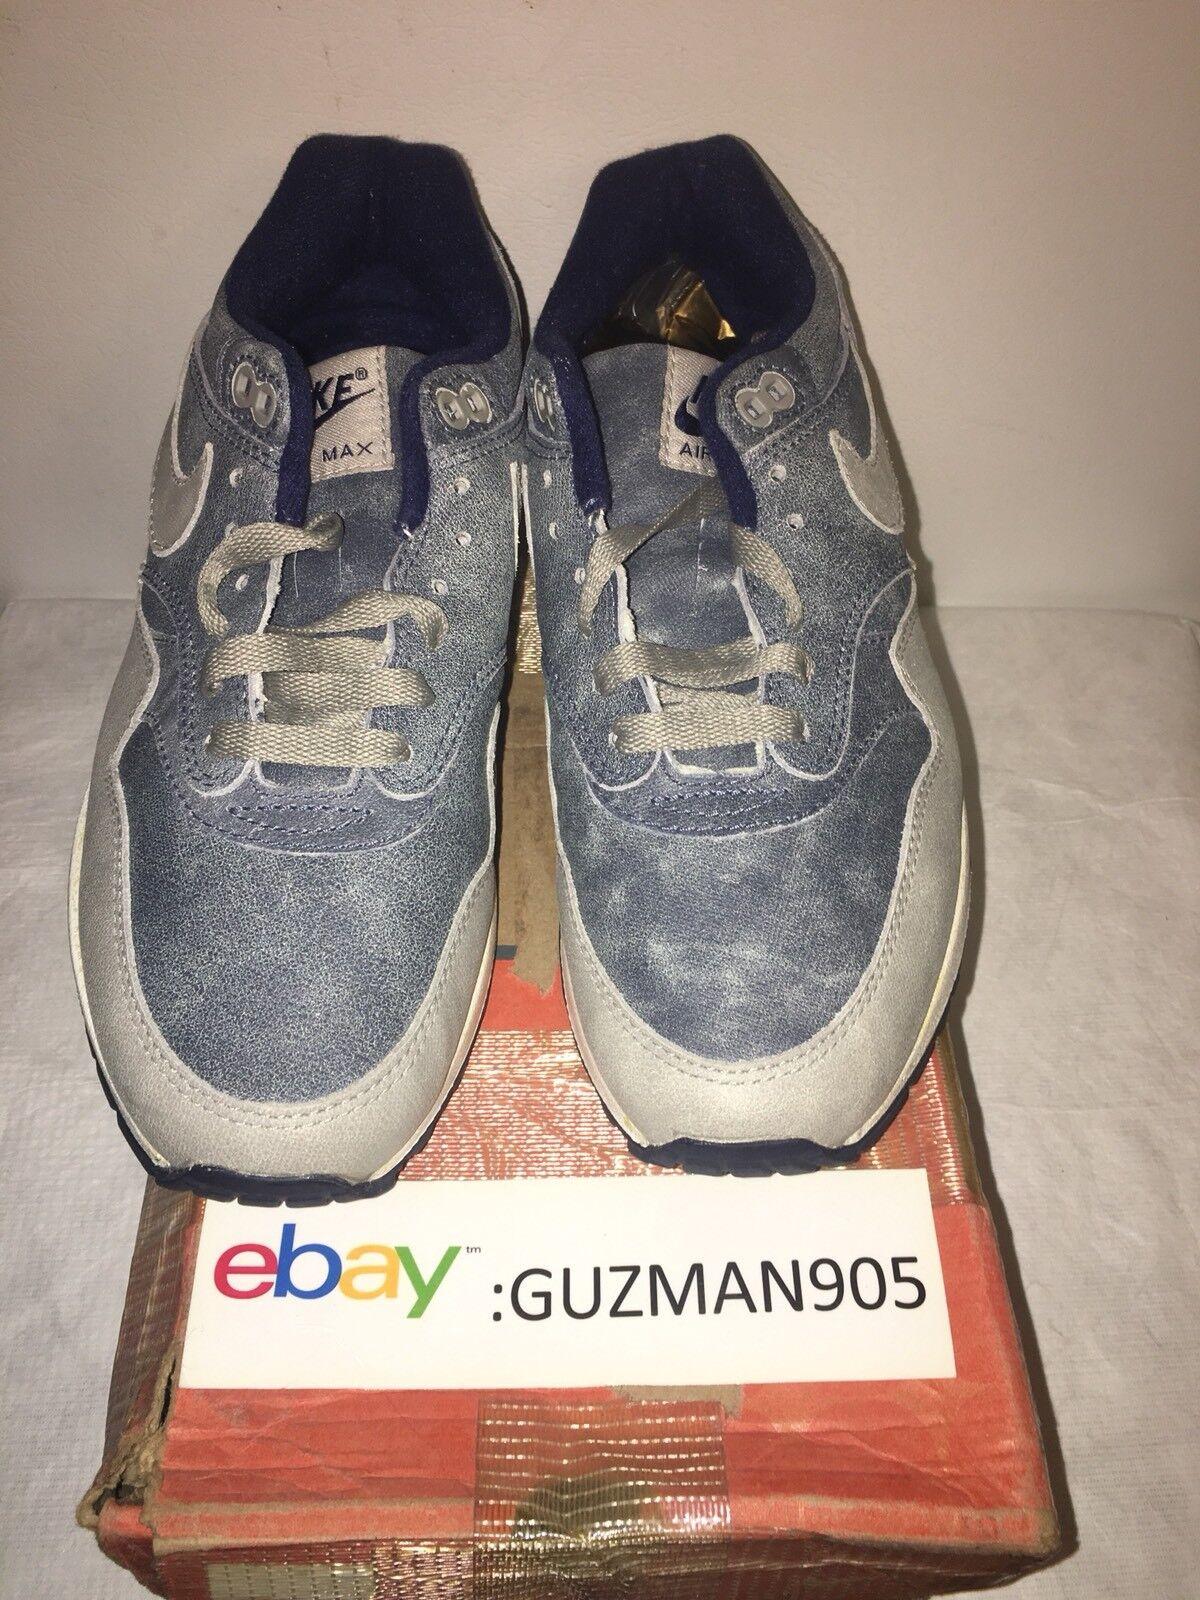 2004 Nike Air Max 1 LTD Dirty Denim Tamaño 8.5 307779 401 Euro Patta Mesh 87